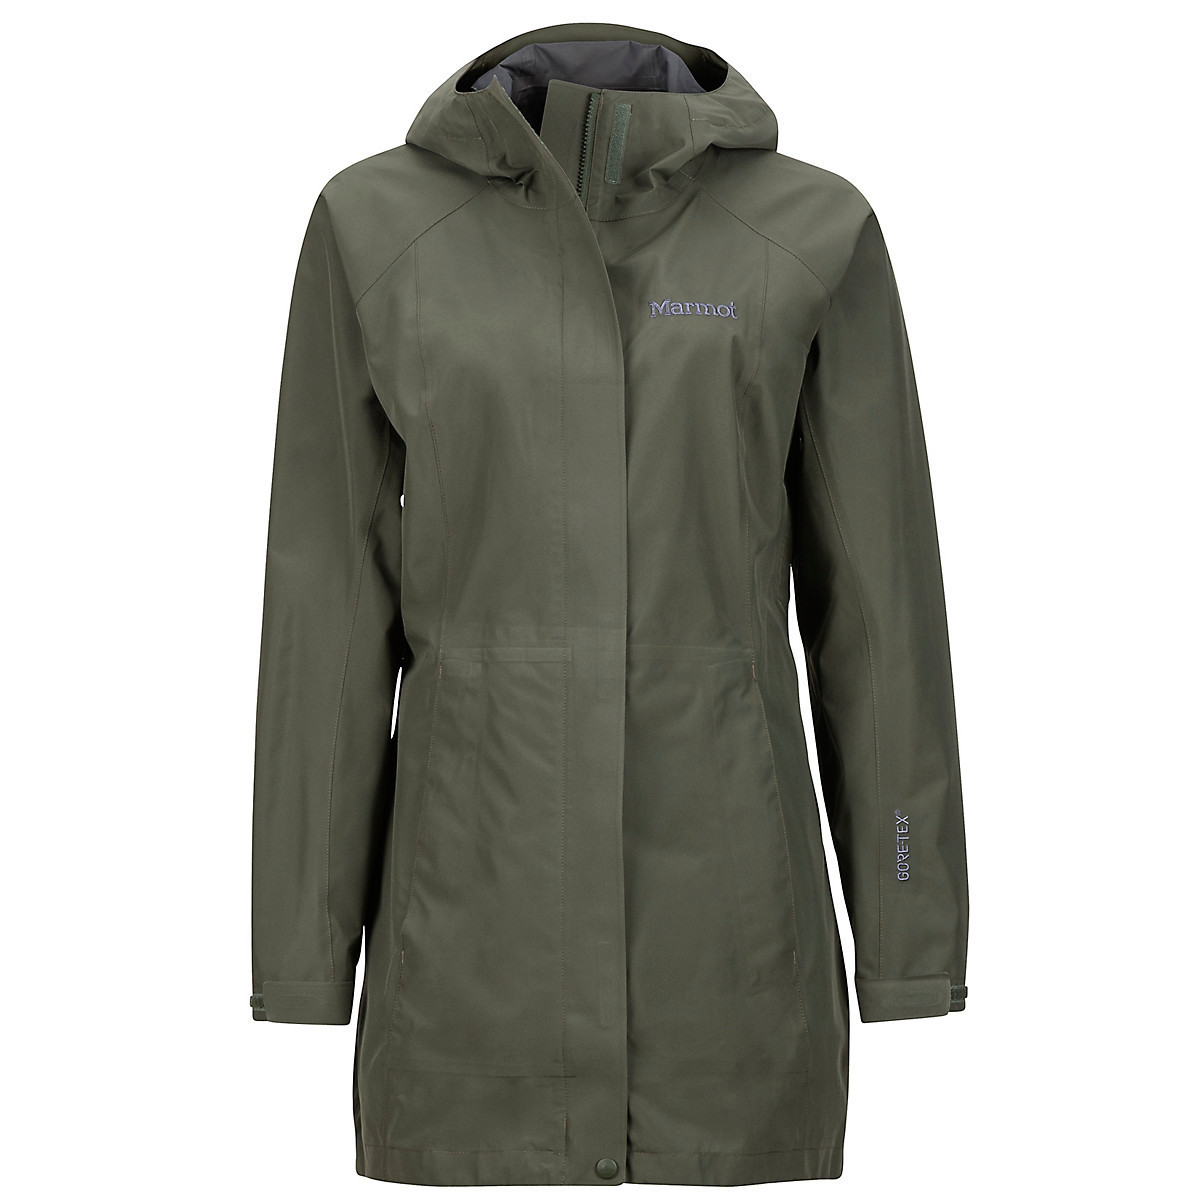 Marmot Women's Essential Jacket - Green, XL